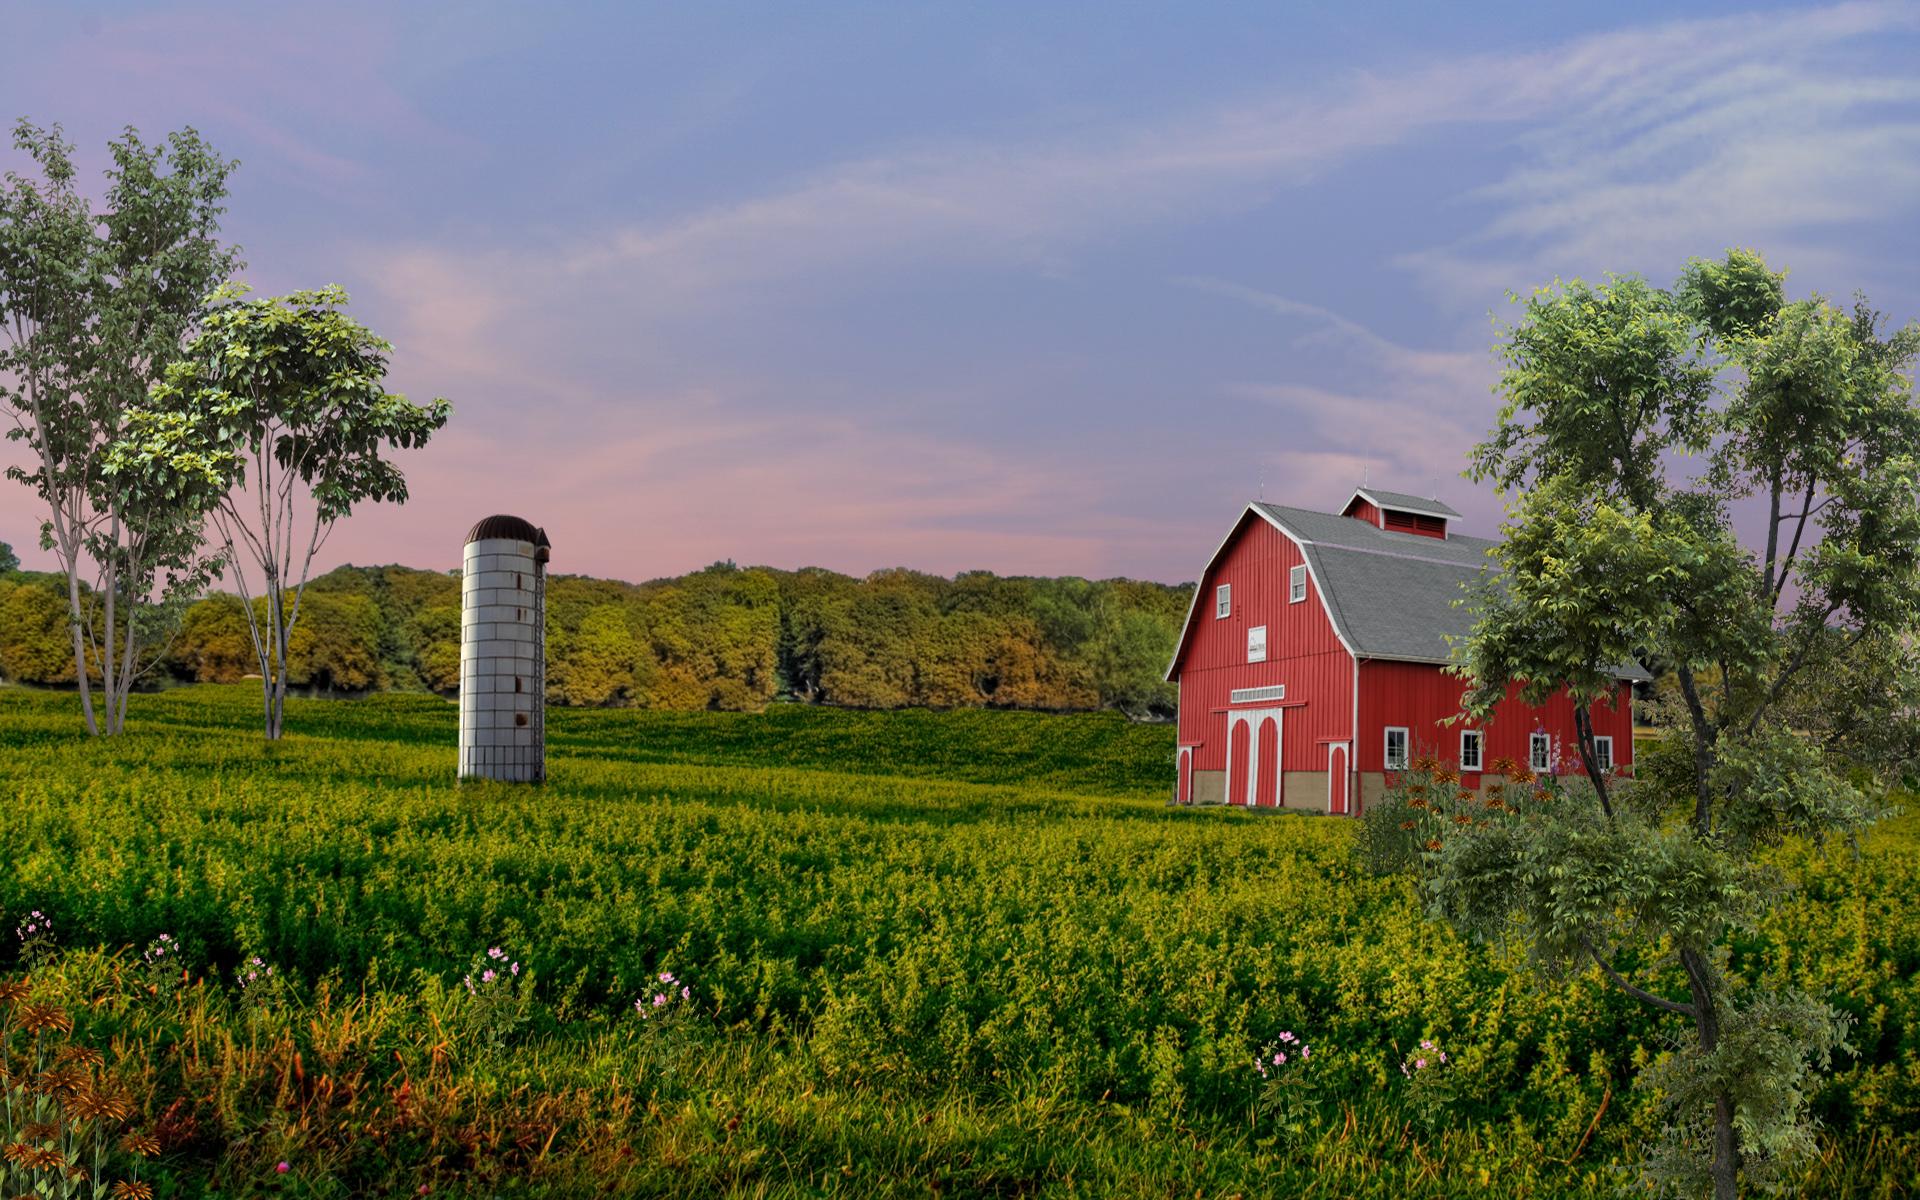 Virginia Farm wallpaper   282296 1920x1200